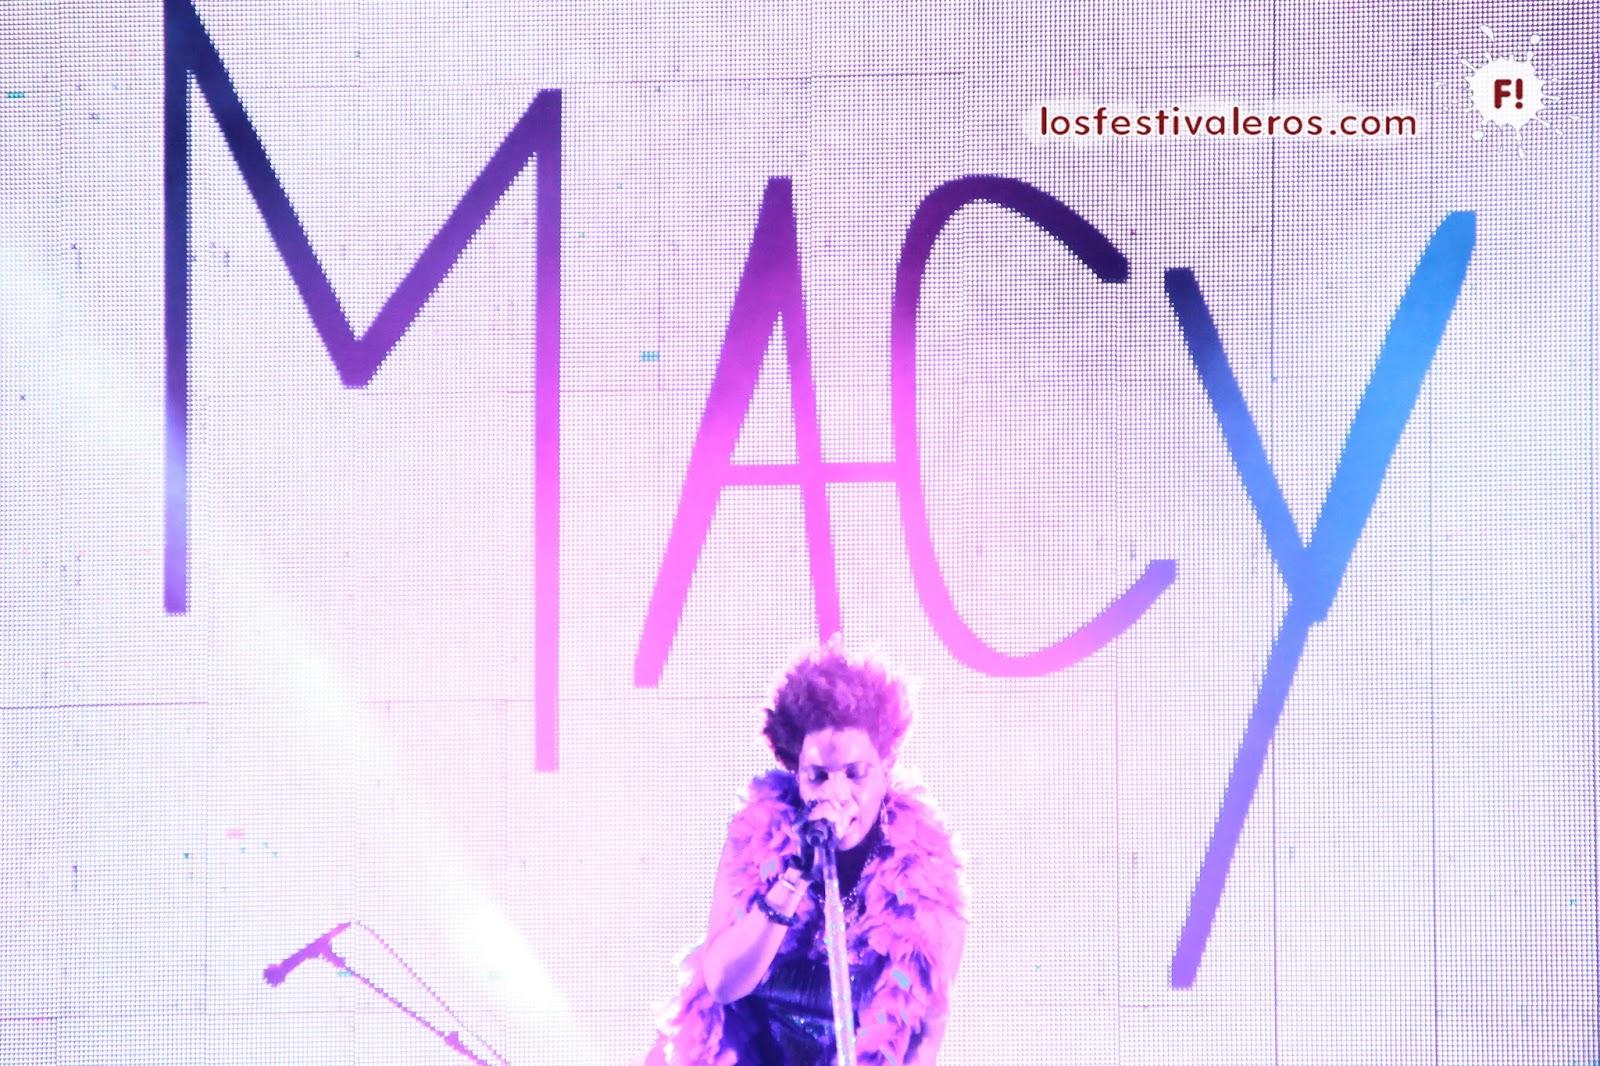 Macy Gray, BIME, 2014, Festival, Concierto